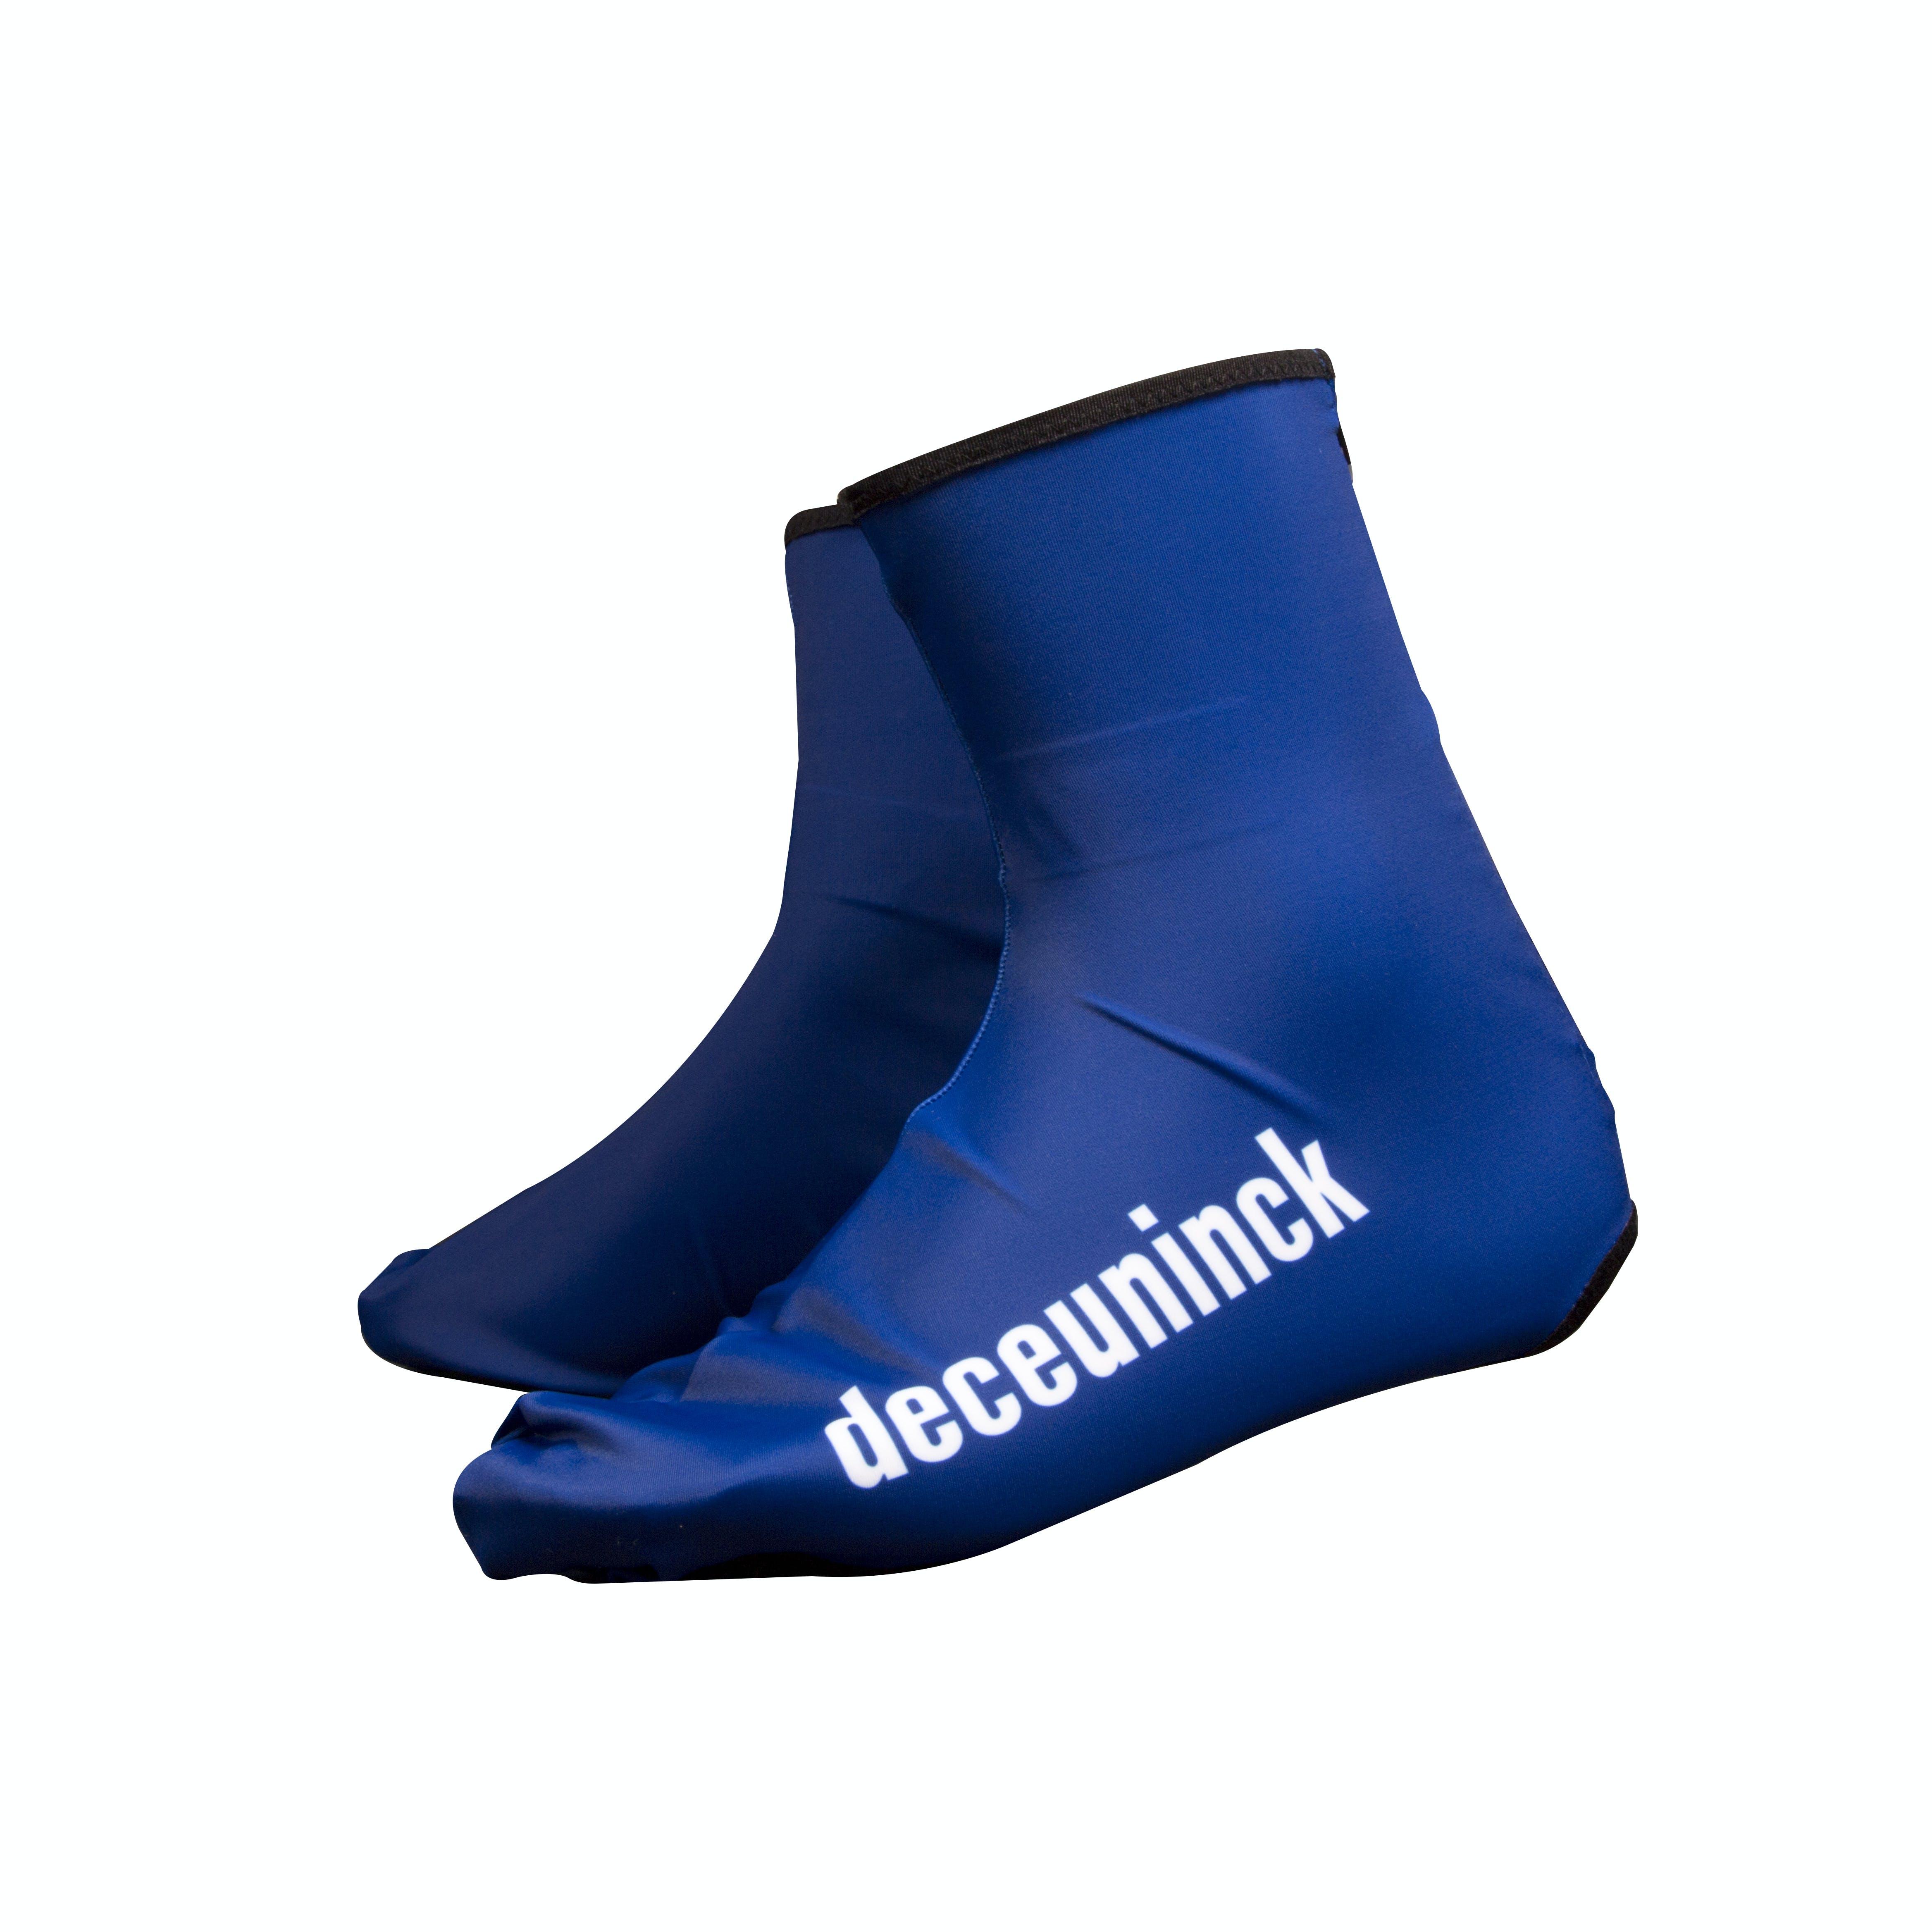 Deceuninck Quick-Step 2020 Shoecover Lycra